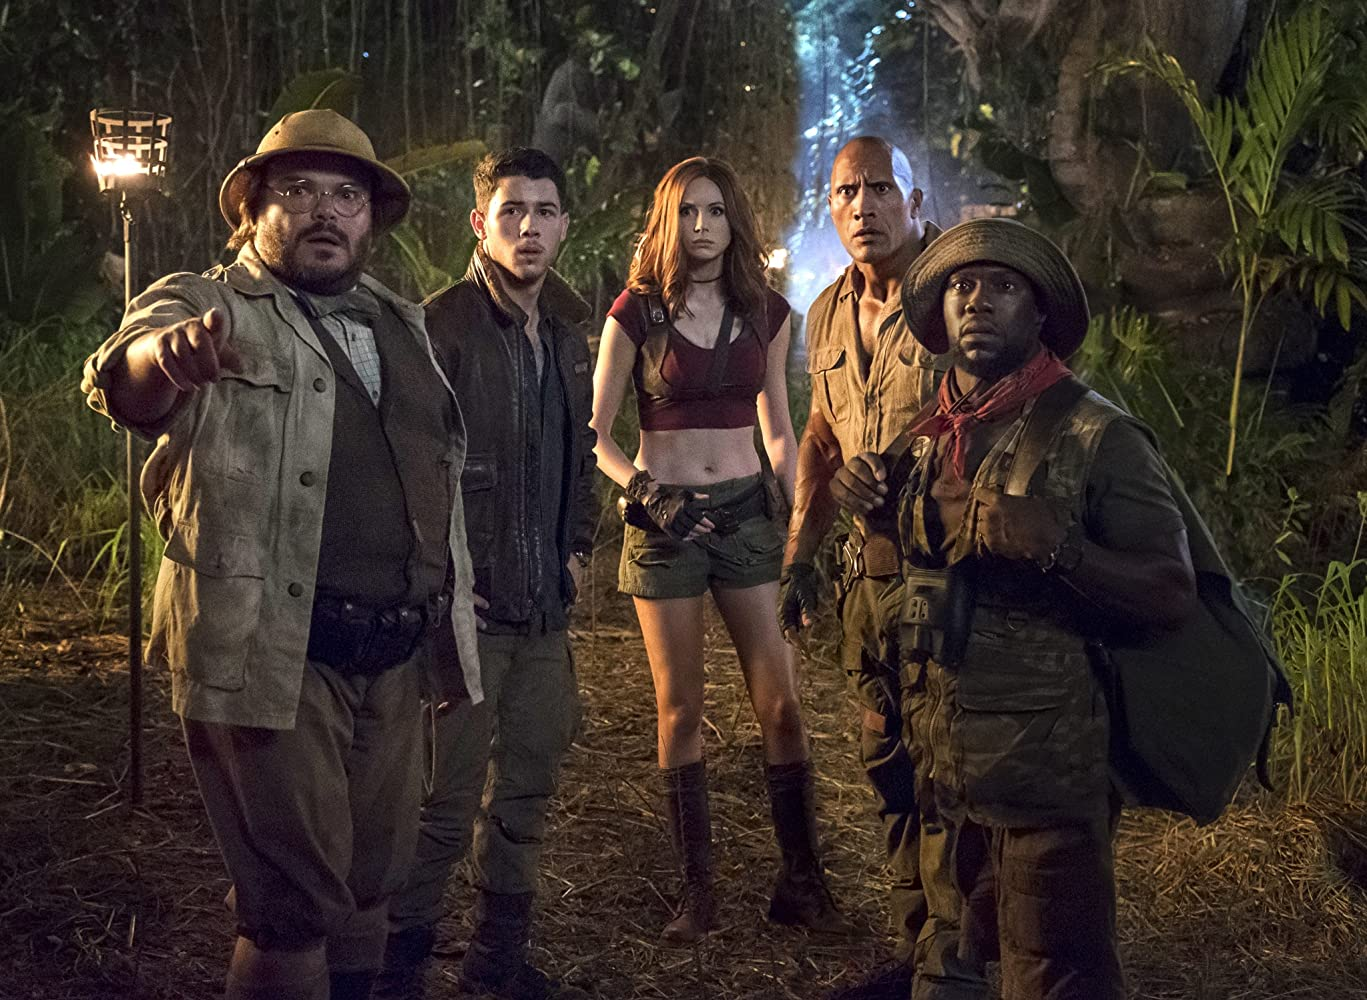 Jack Black, Kevin Hart, Dwayne Johnson, Karen Gillan, and Nick Jonas in Jumanji: Welcome to the Jungle (2017)